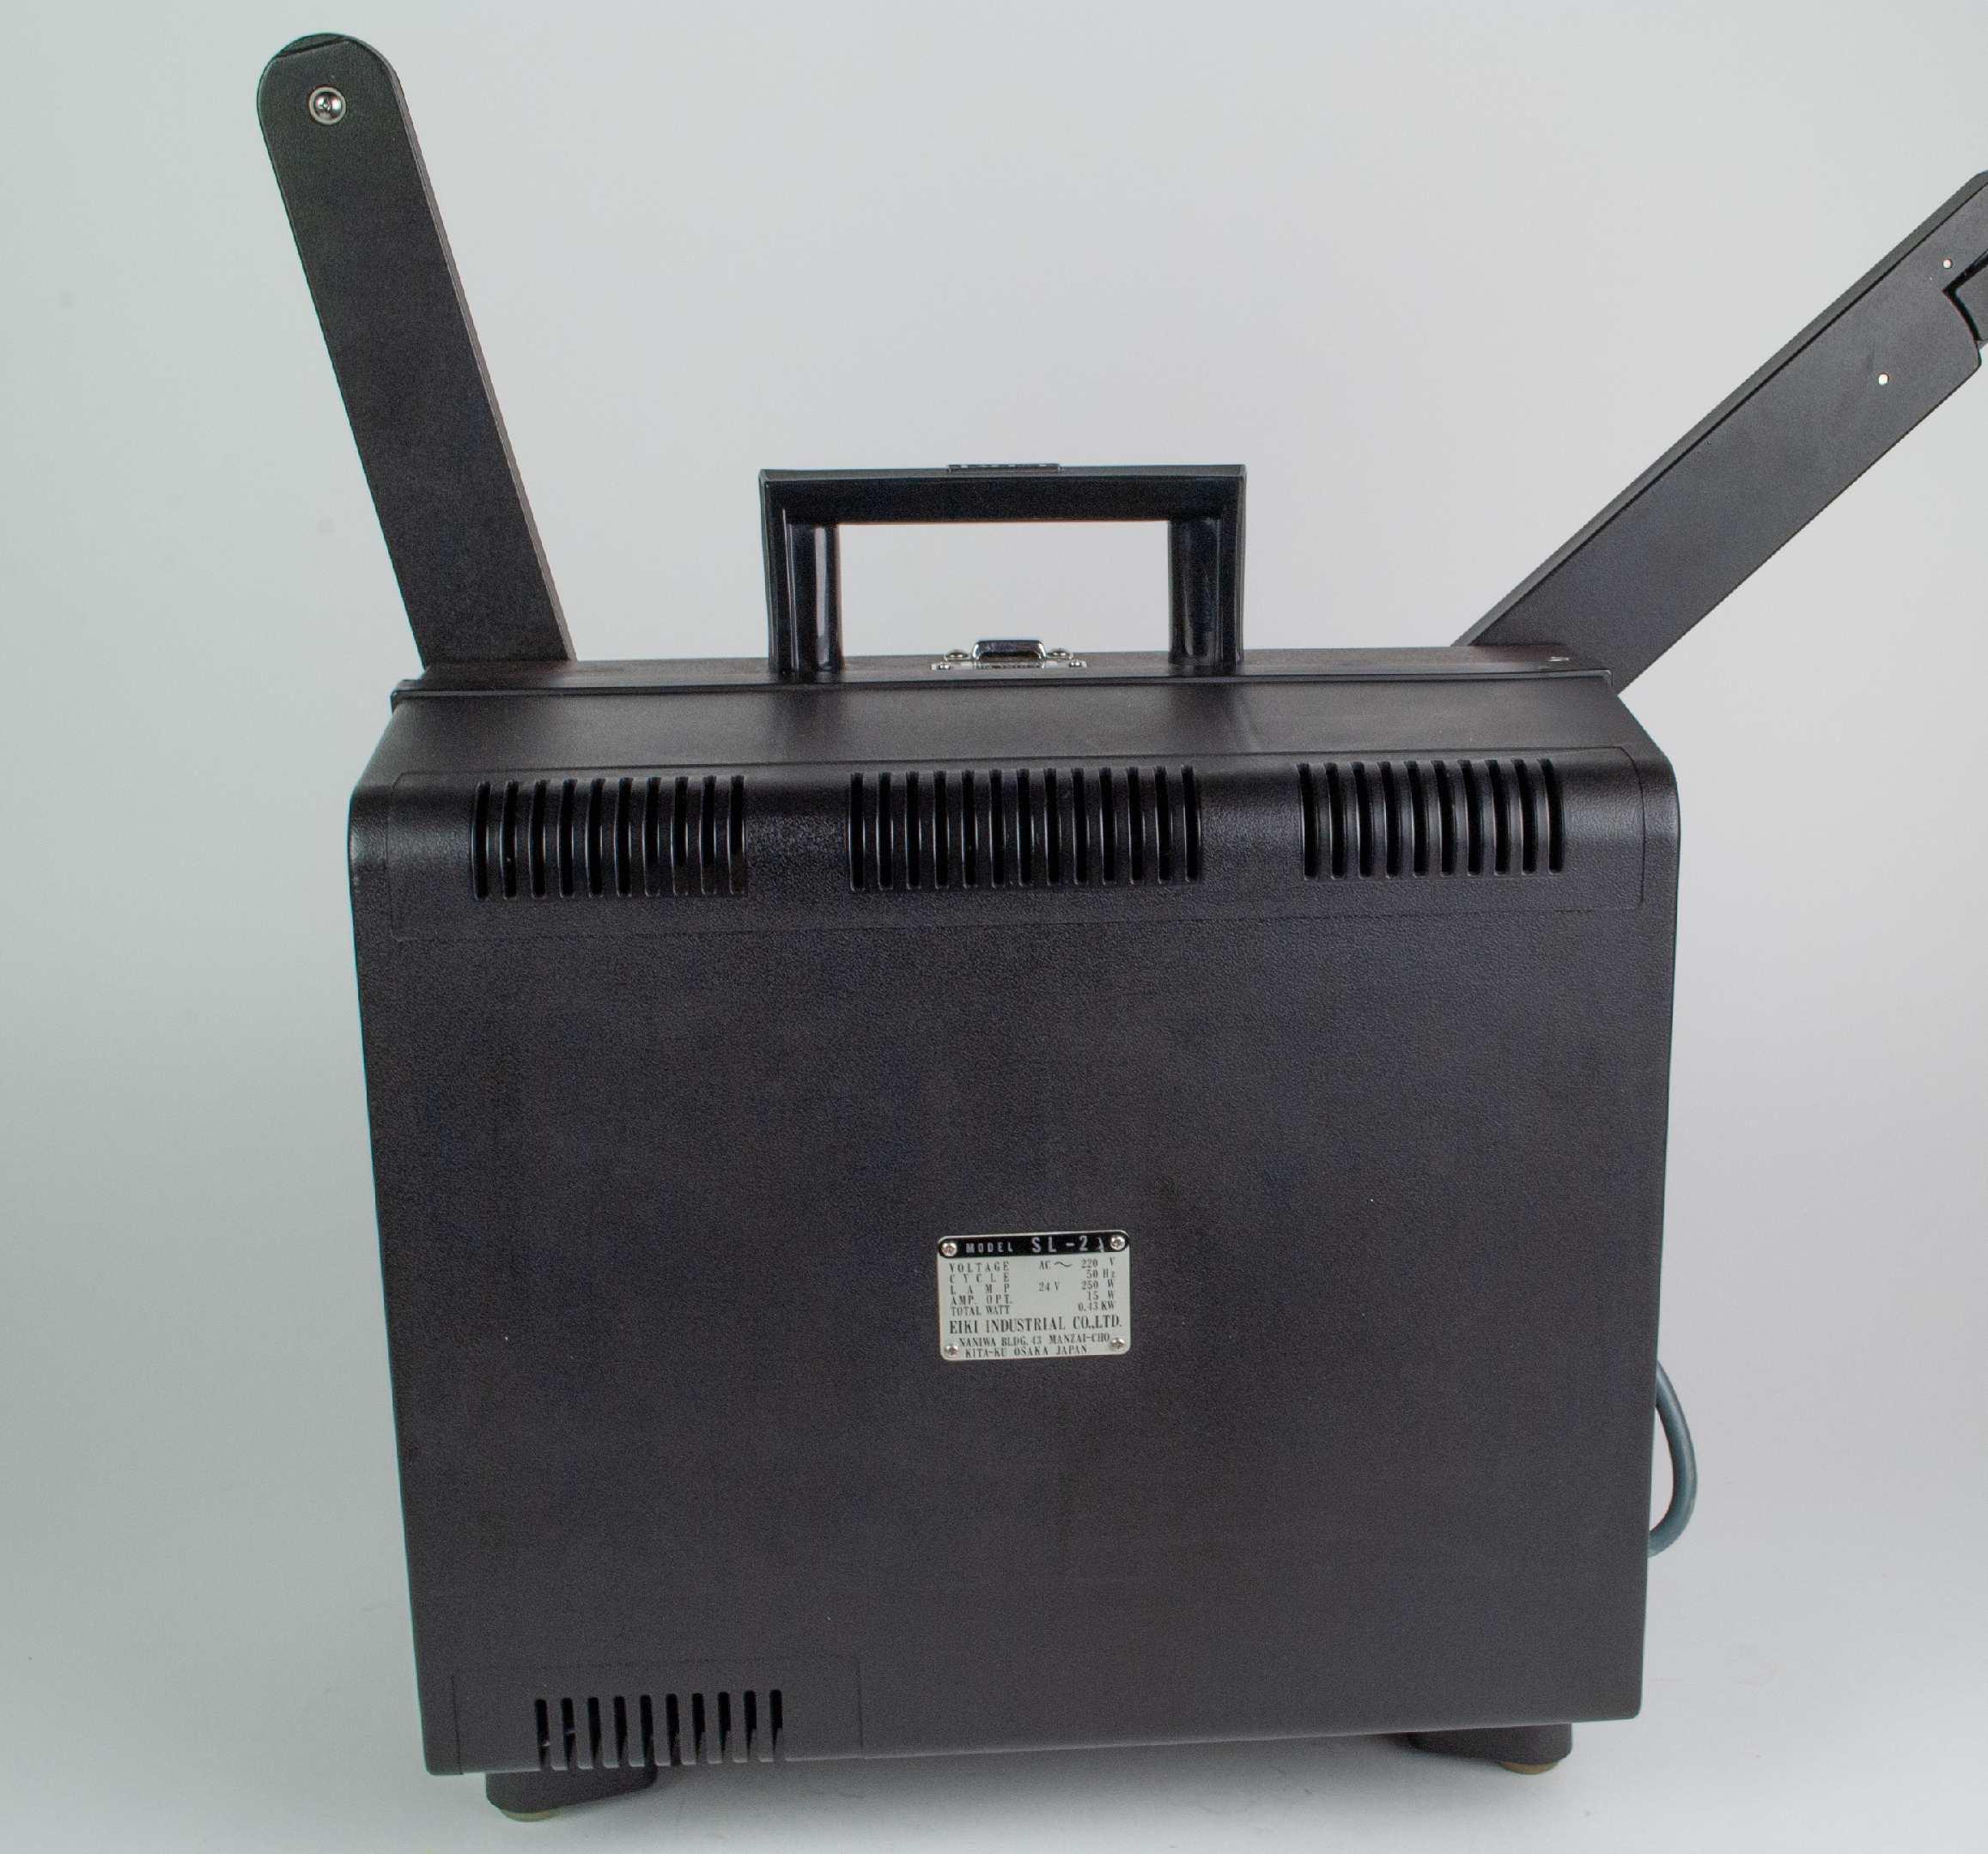 Eiki SL-2 (Super Slot Load), Film Projectors - Spare Parts